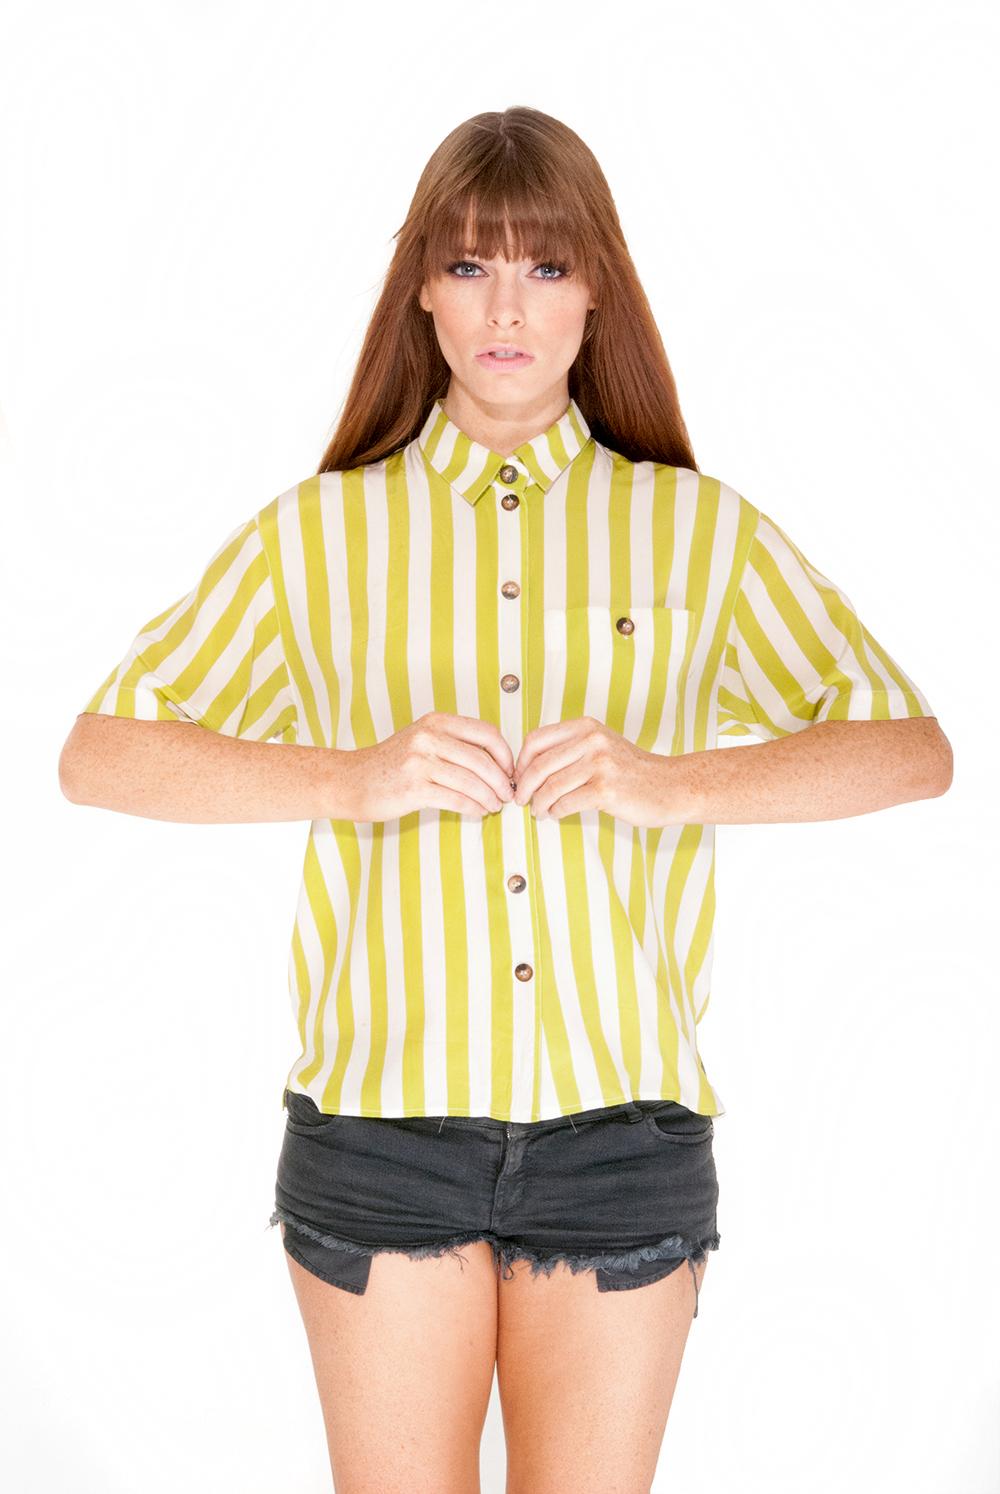 977424b1d92535 Vintage Liz Claiborne Stripe Shirt on Storenvy